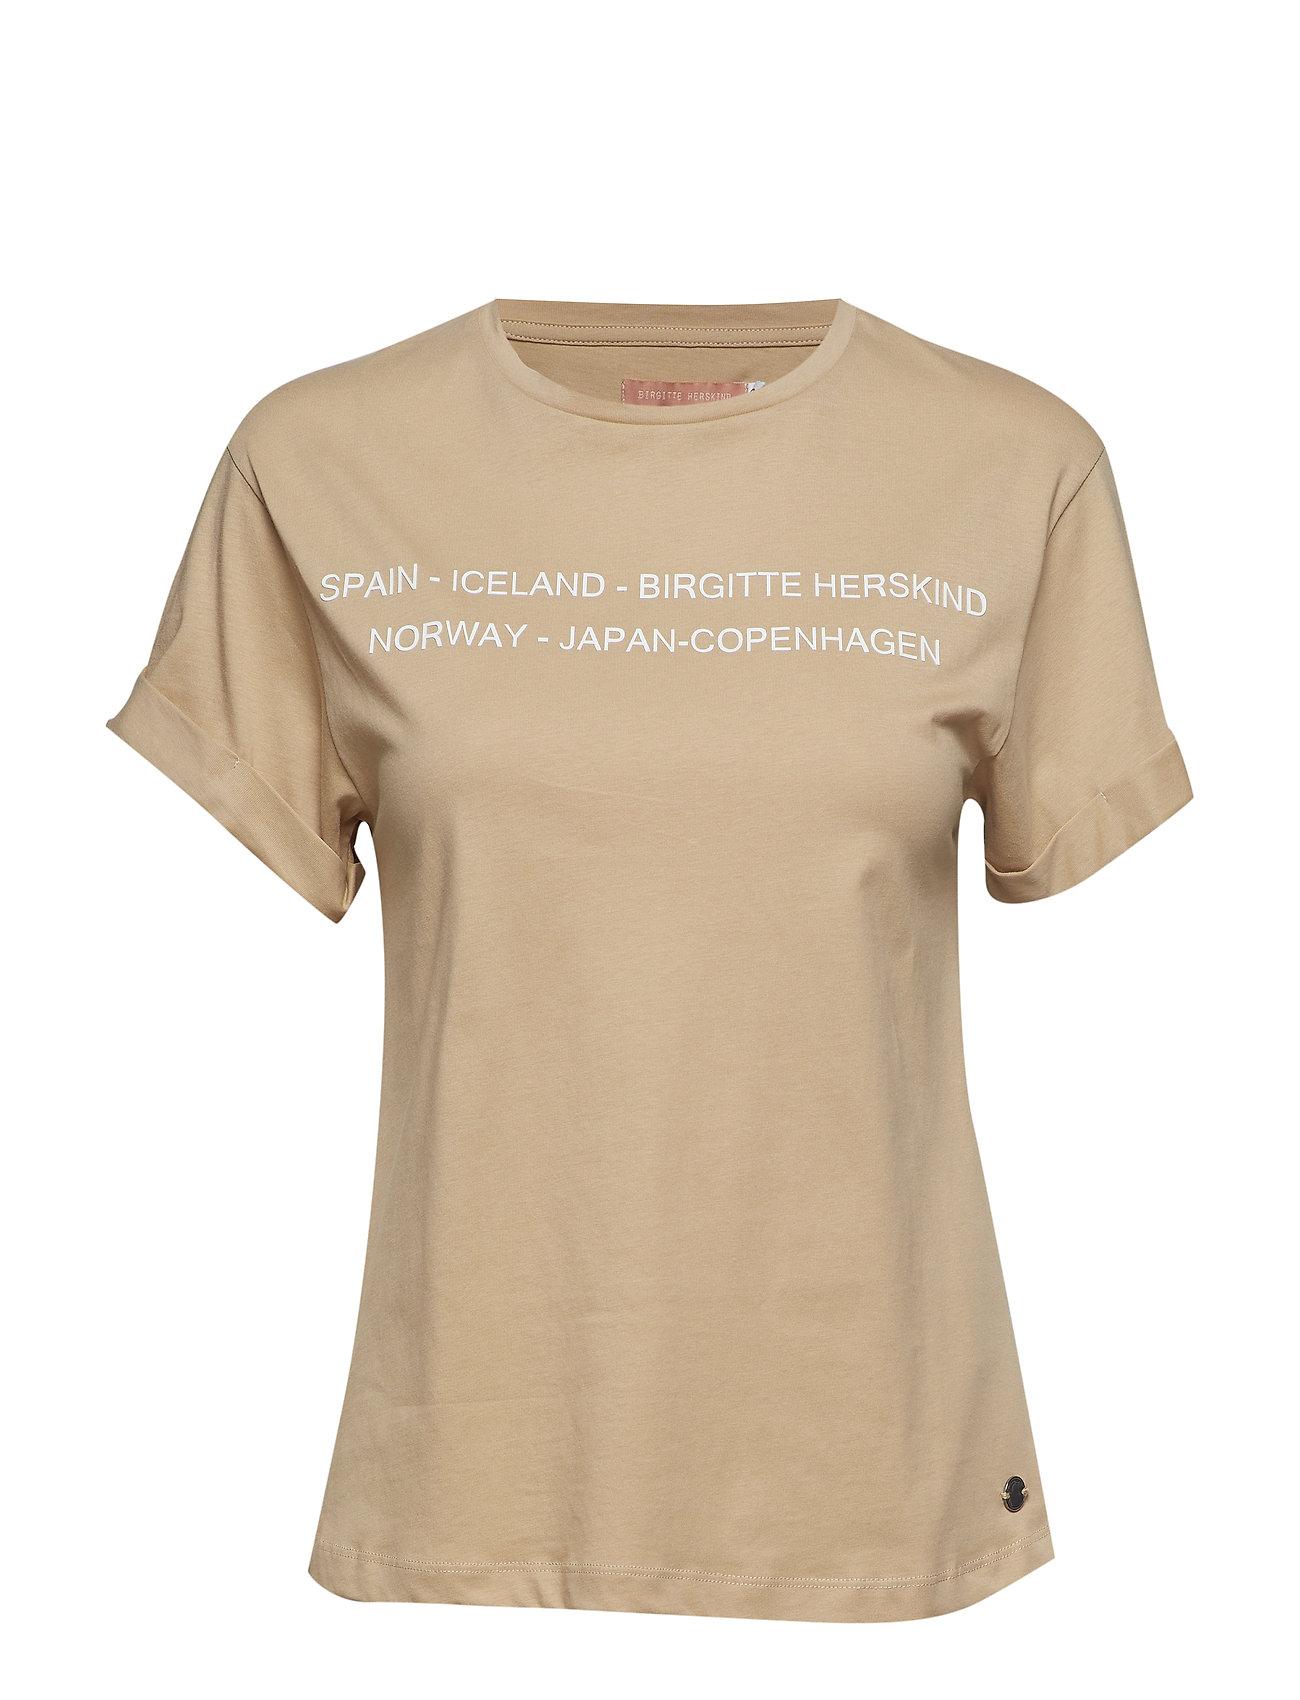 shirtnormadeBirgitte Cee Cee T Herskind T shirtnormadeBirgitte 3jLqSRc54A